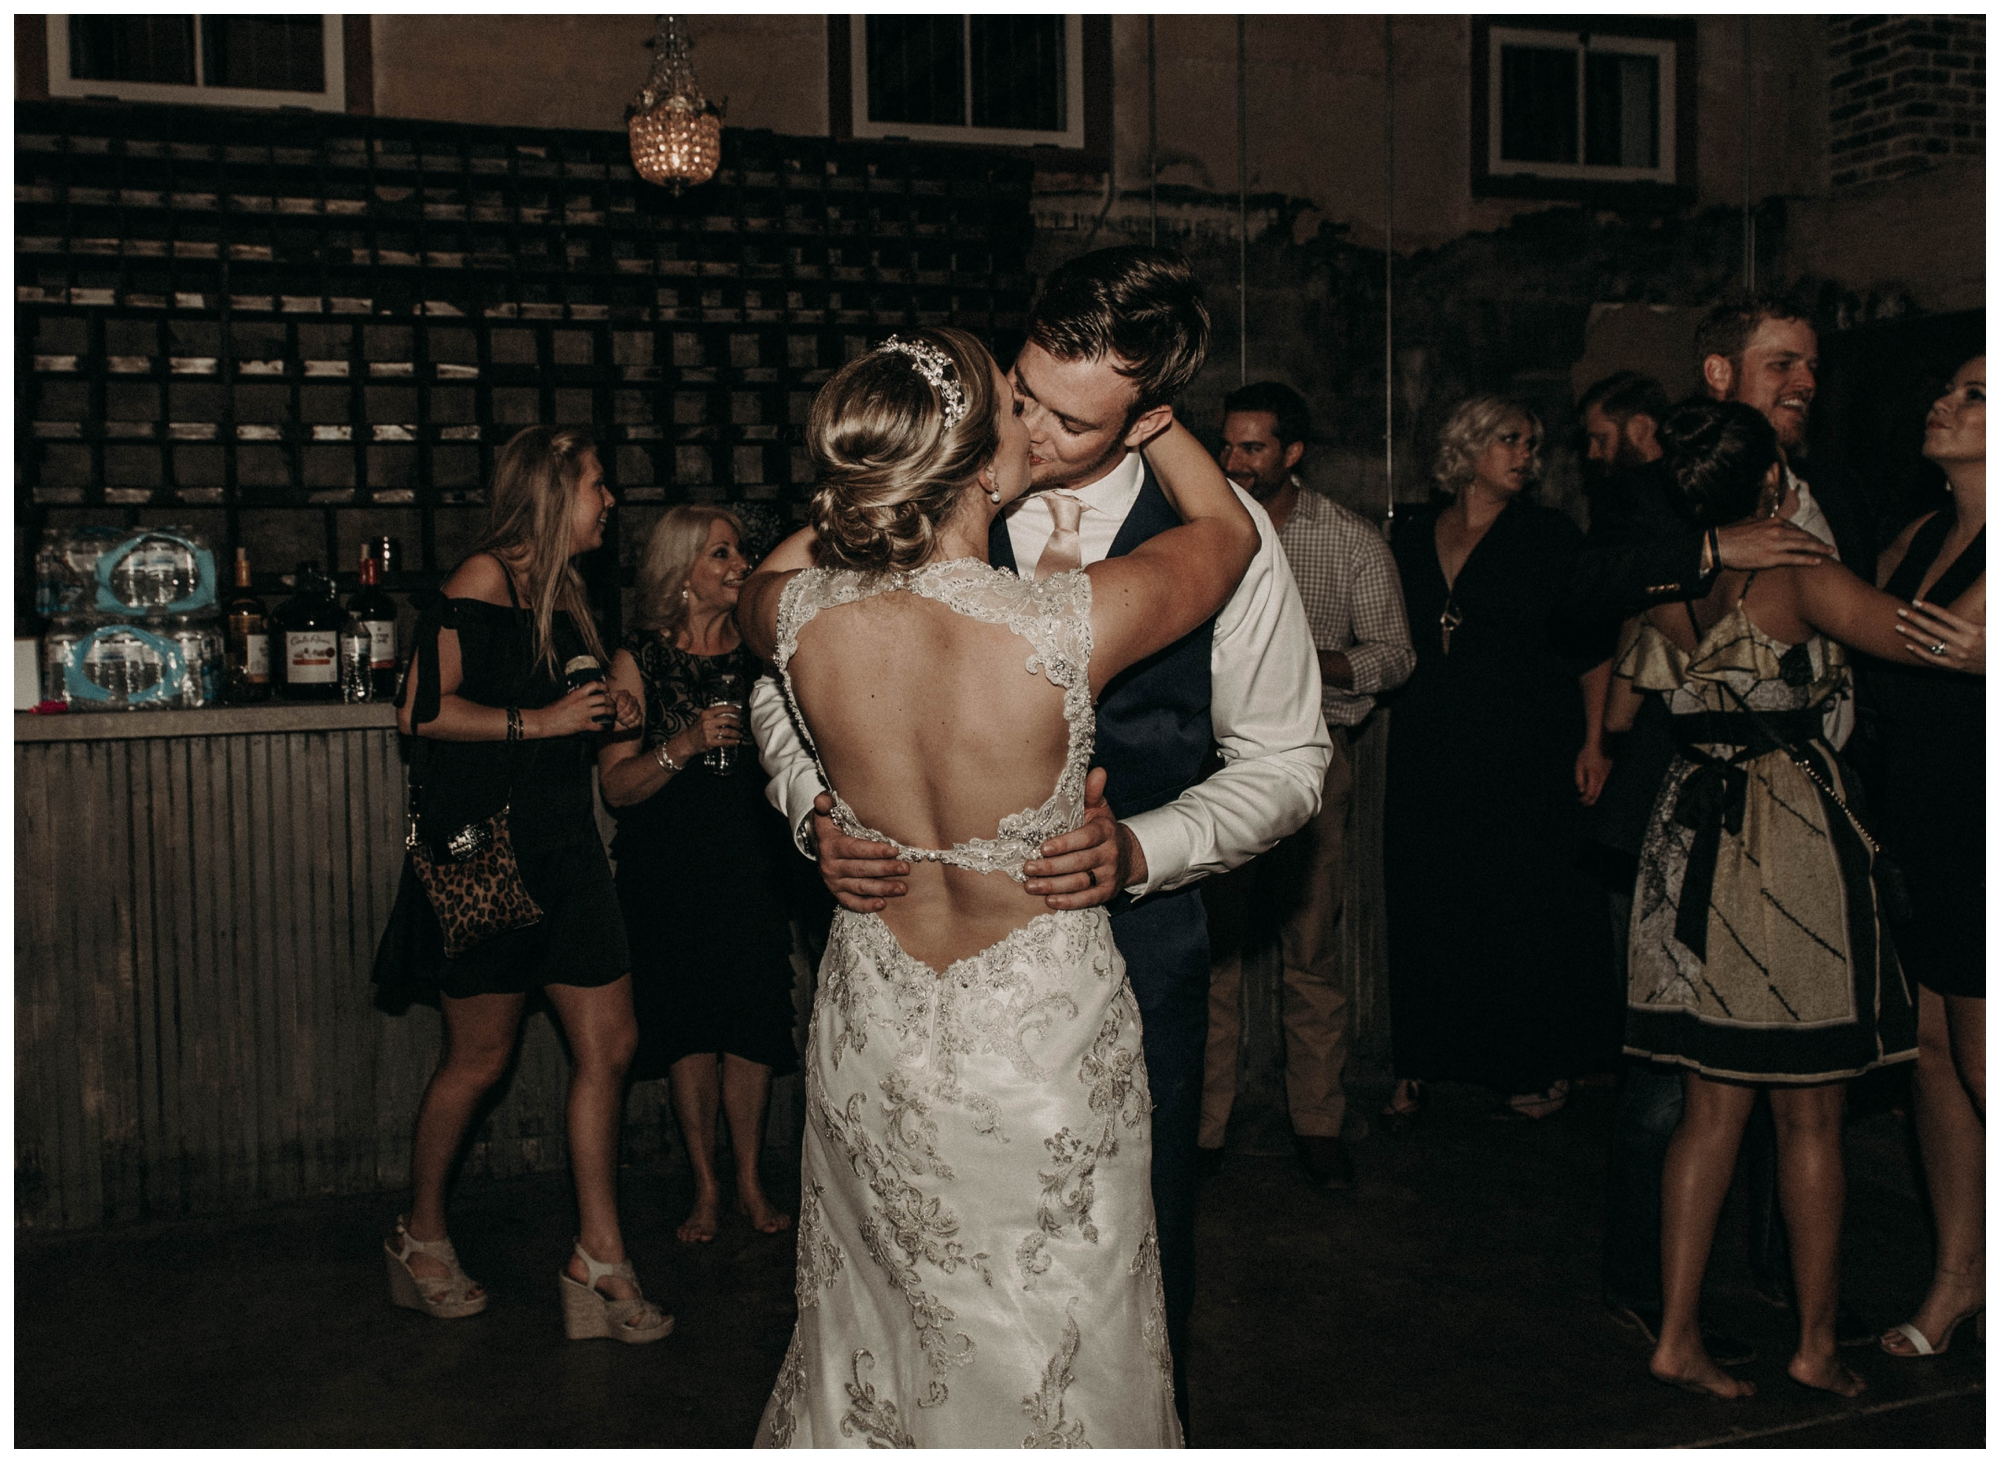 austin-texas-wedding-photography-1778-photographie_0144.jpg